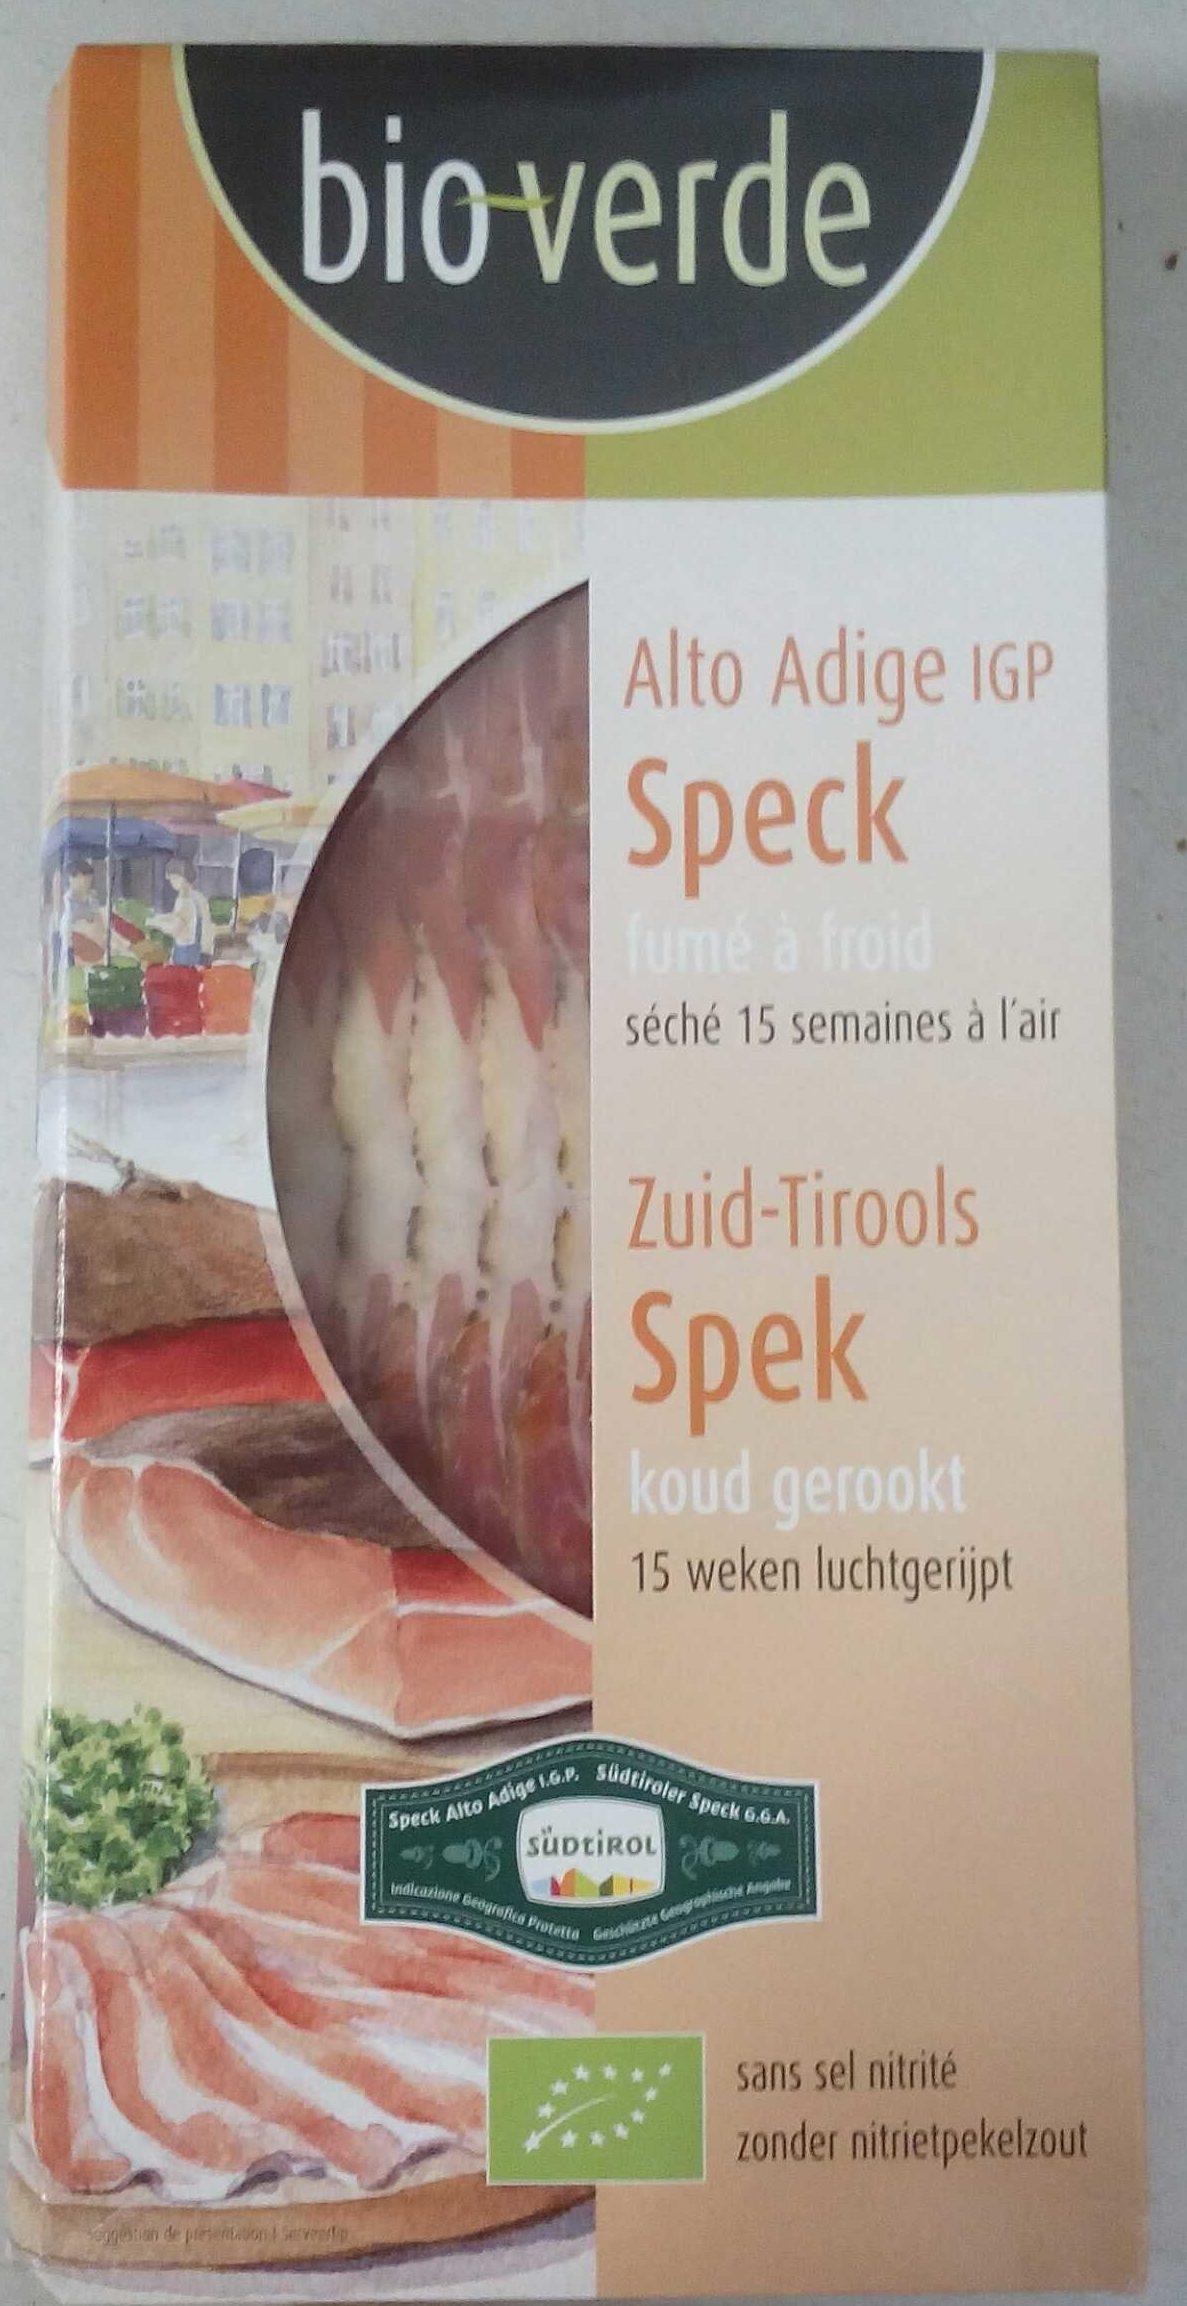 Alto Adige IGP Speck - Product